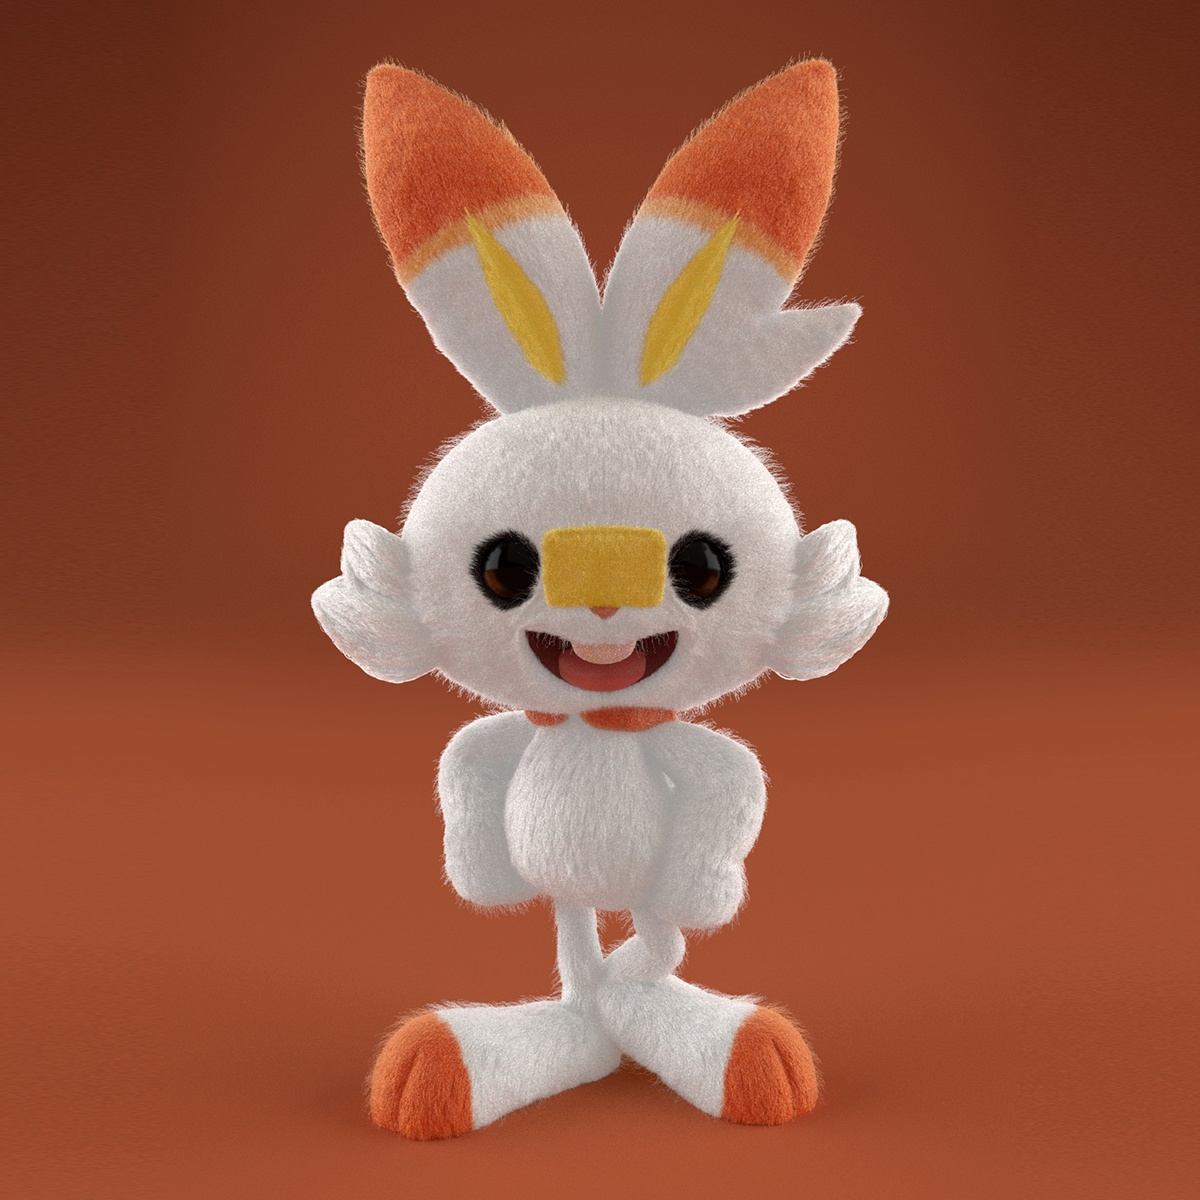 scorbunny pokemon bunny character design